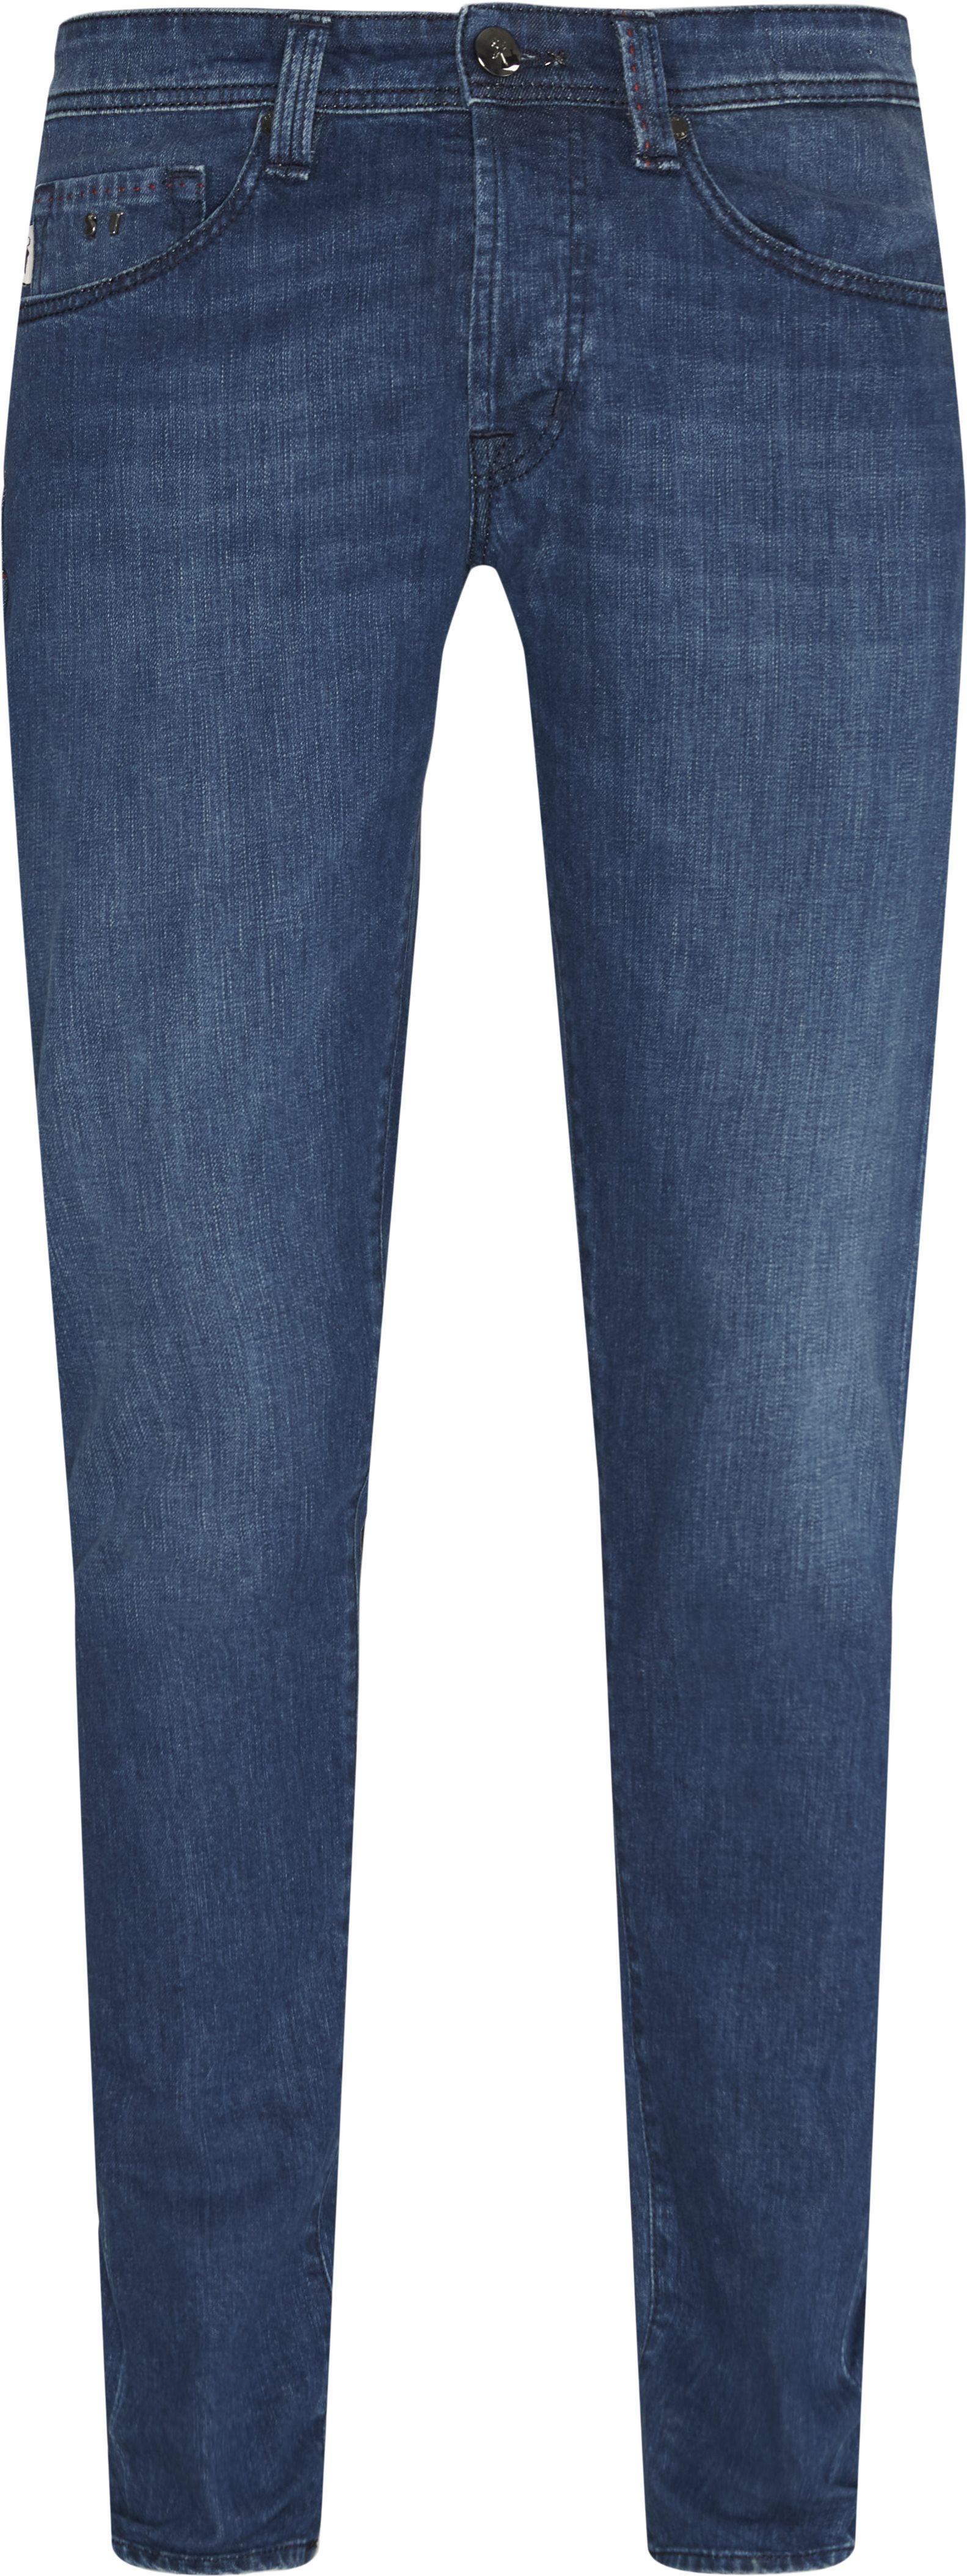 Month Jeans - Jeans - Regular fit - Denim